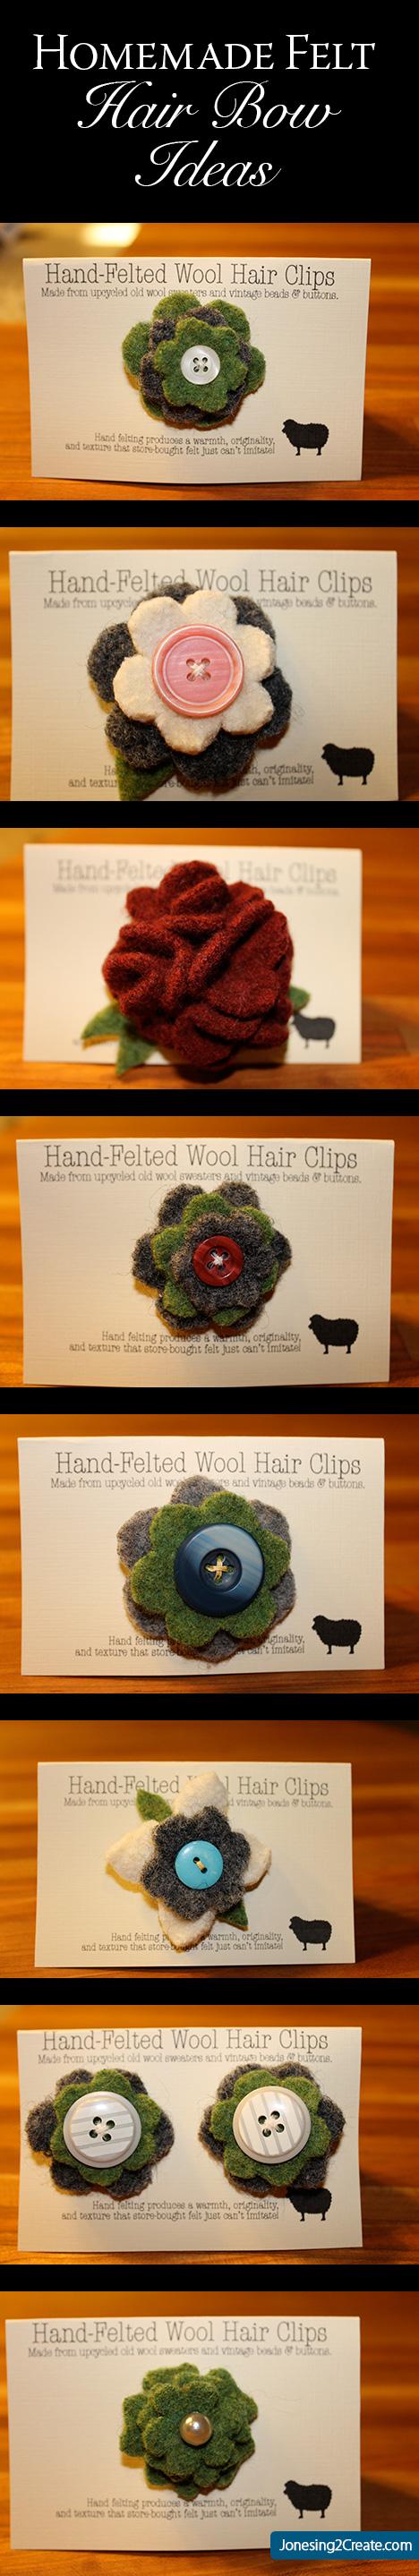 Homemade-Felt-Hair-Bows